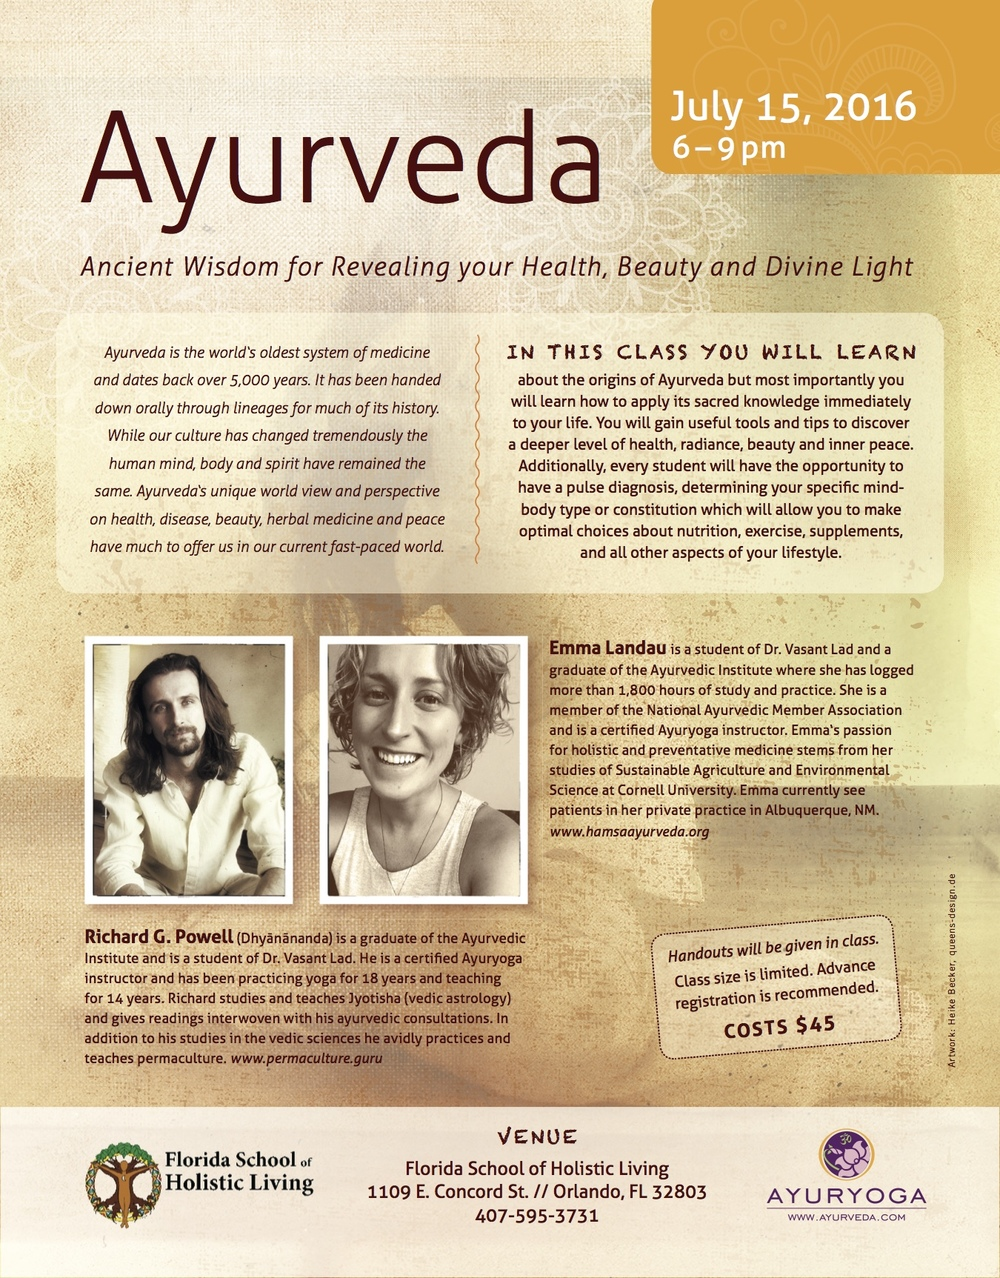 Ayurveda_July15-2016-print-2.jpg